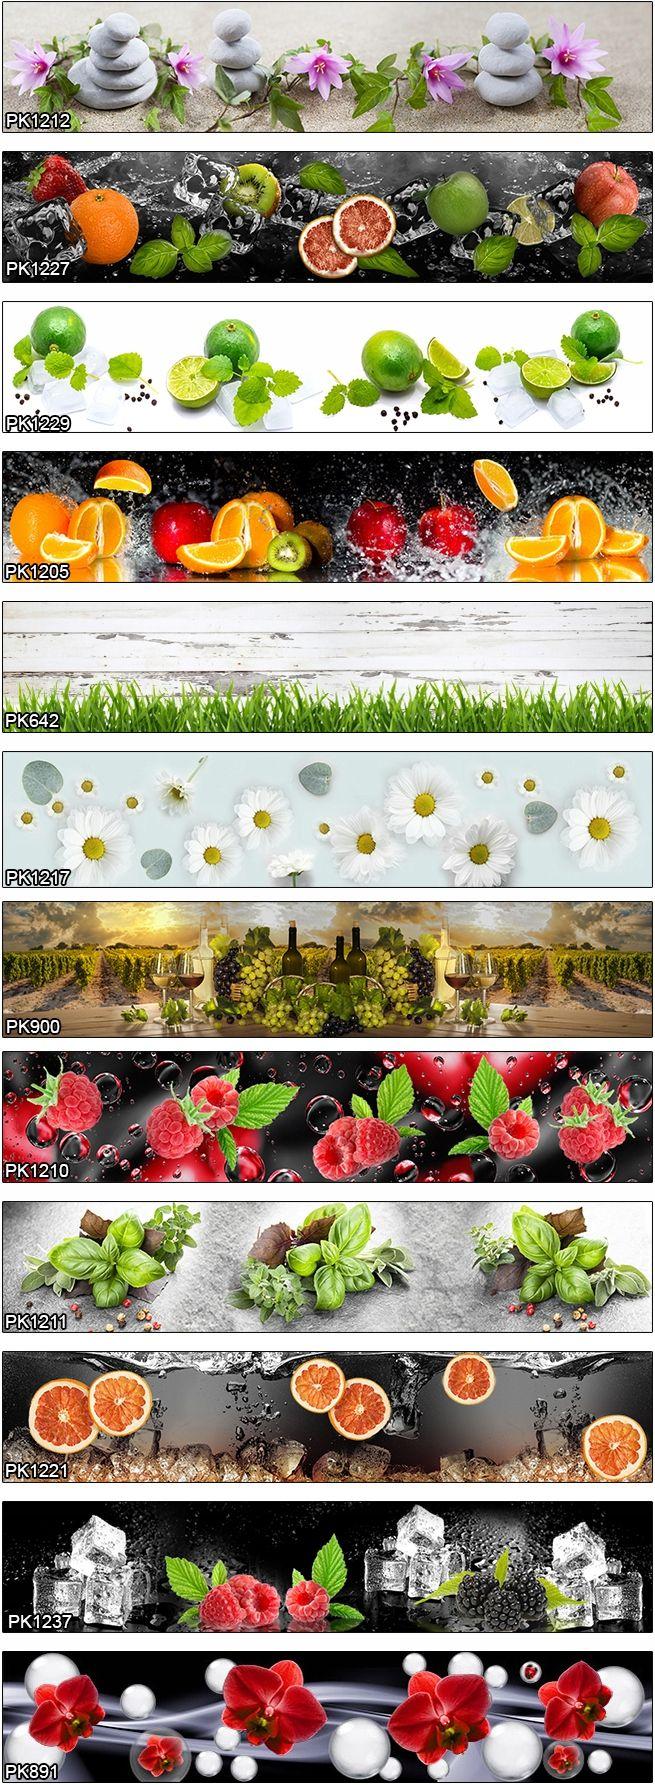 Szklo Hartowane Do Kuchni Panel Szklany Fotolia 7911228131 Allegro Pl Pattern Art Pattern